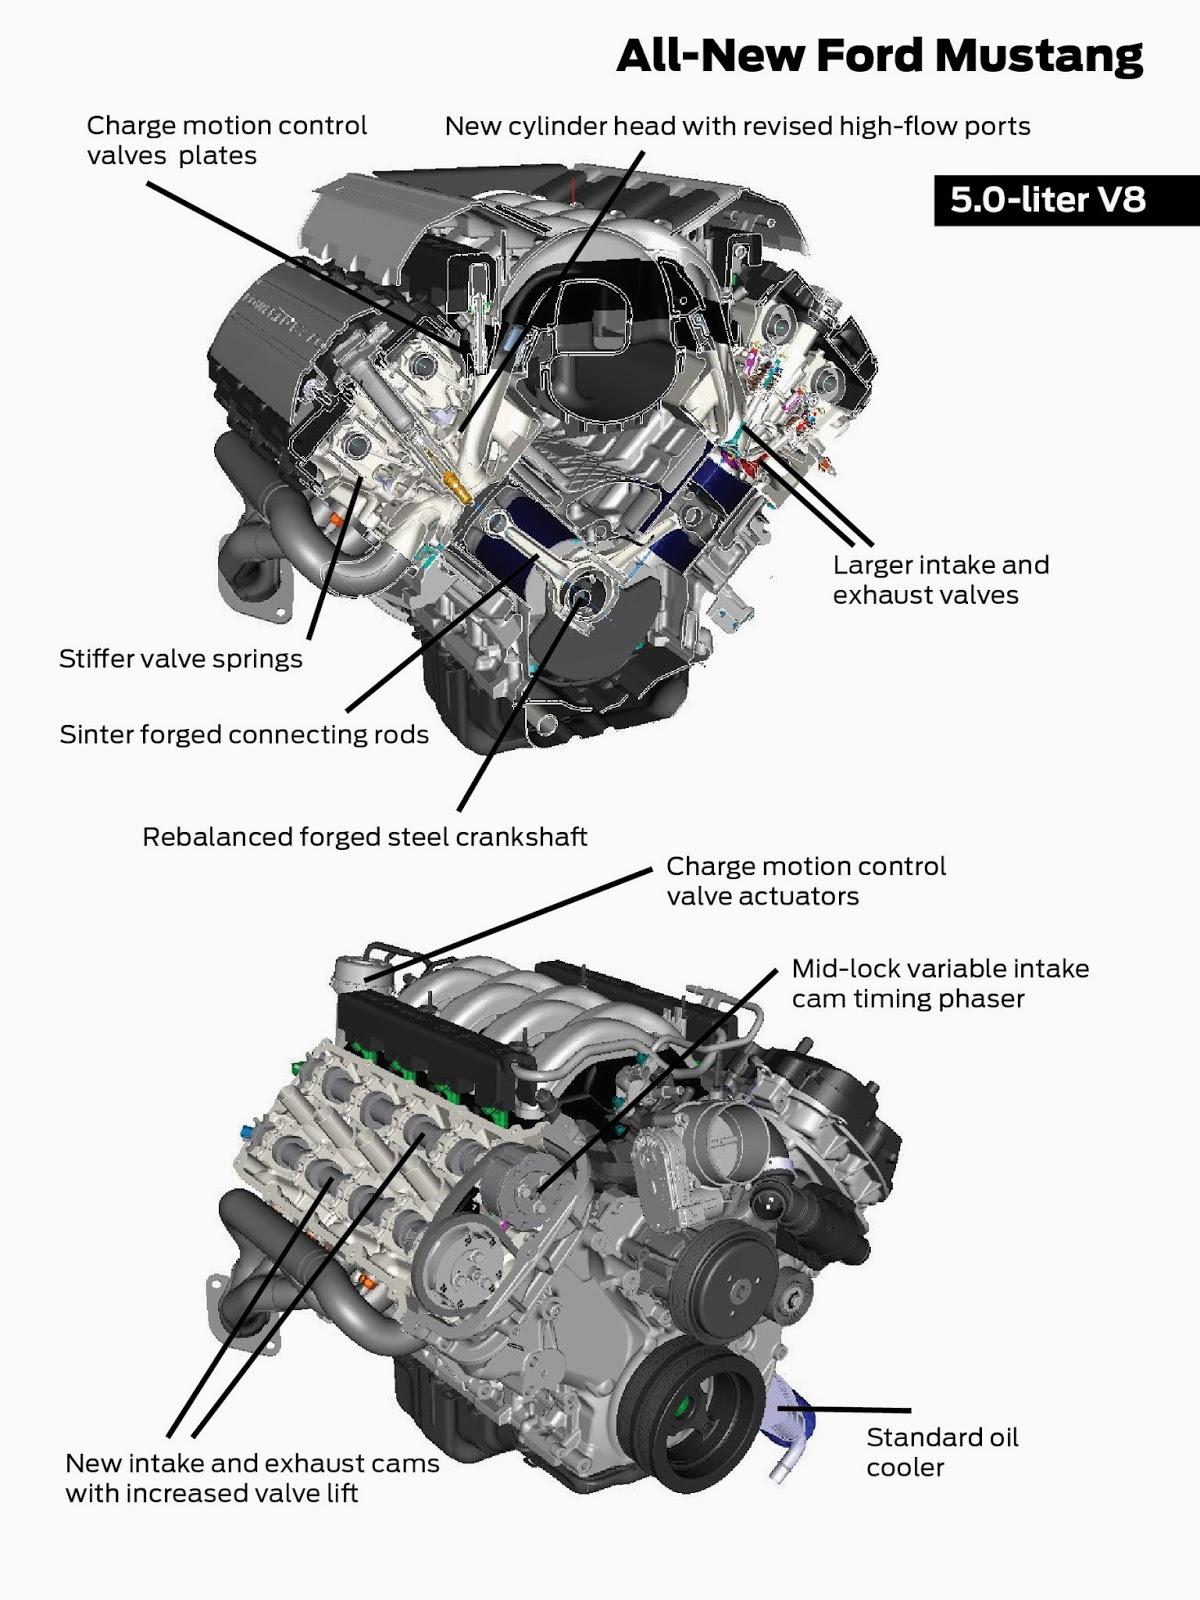 All-New+Ford+Mustang+5.0-Liter+V8+.